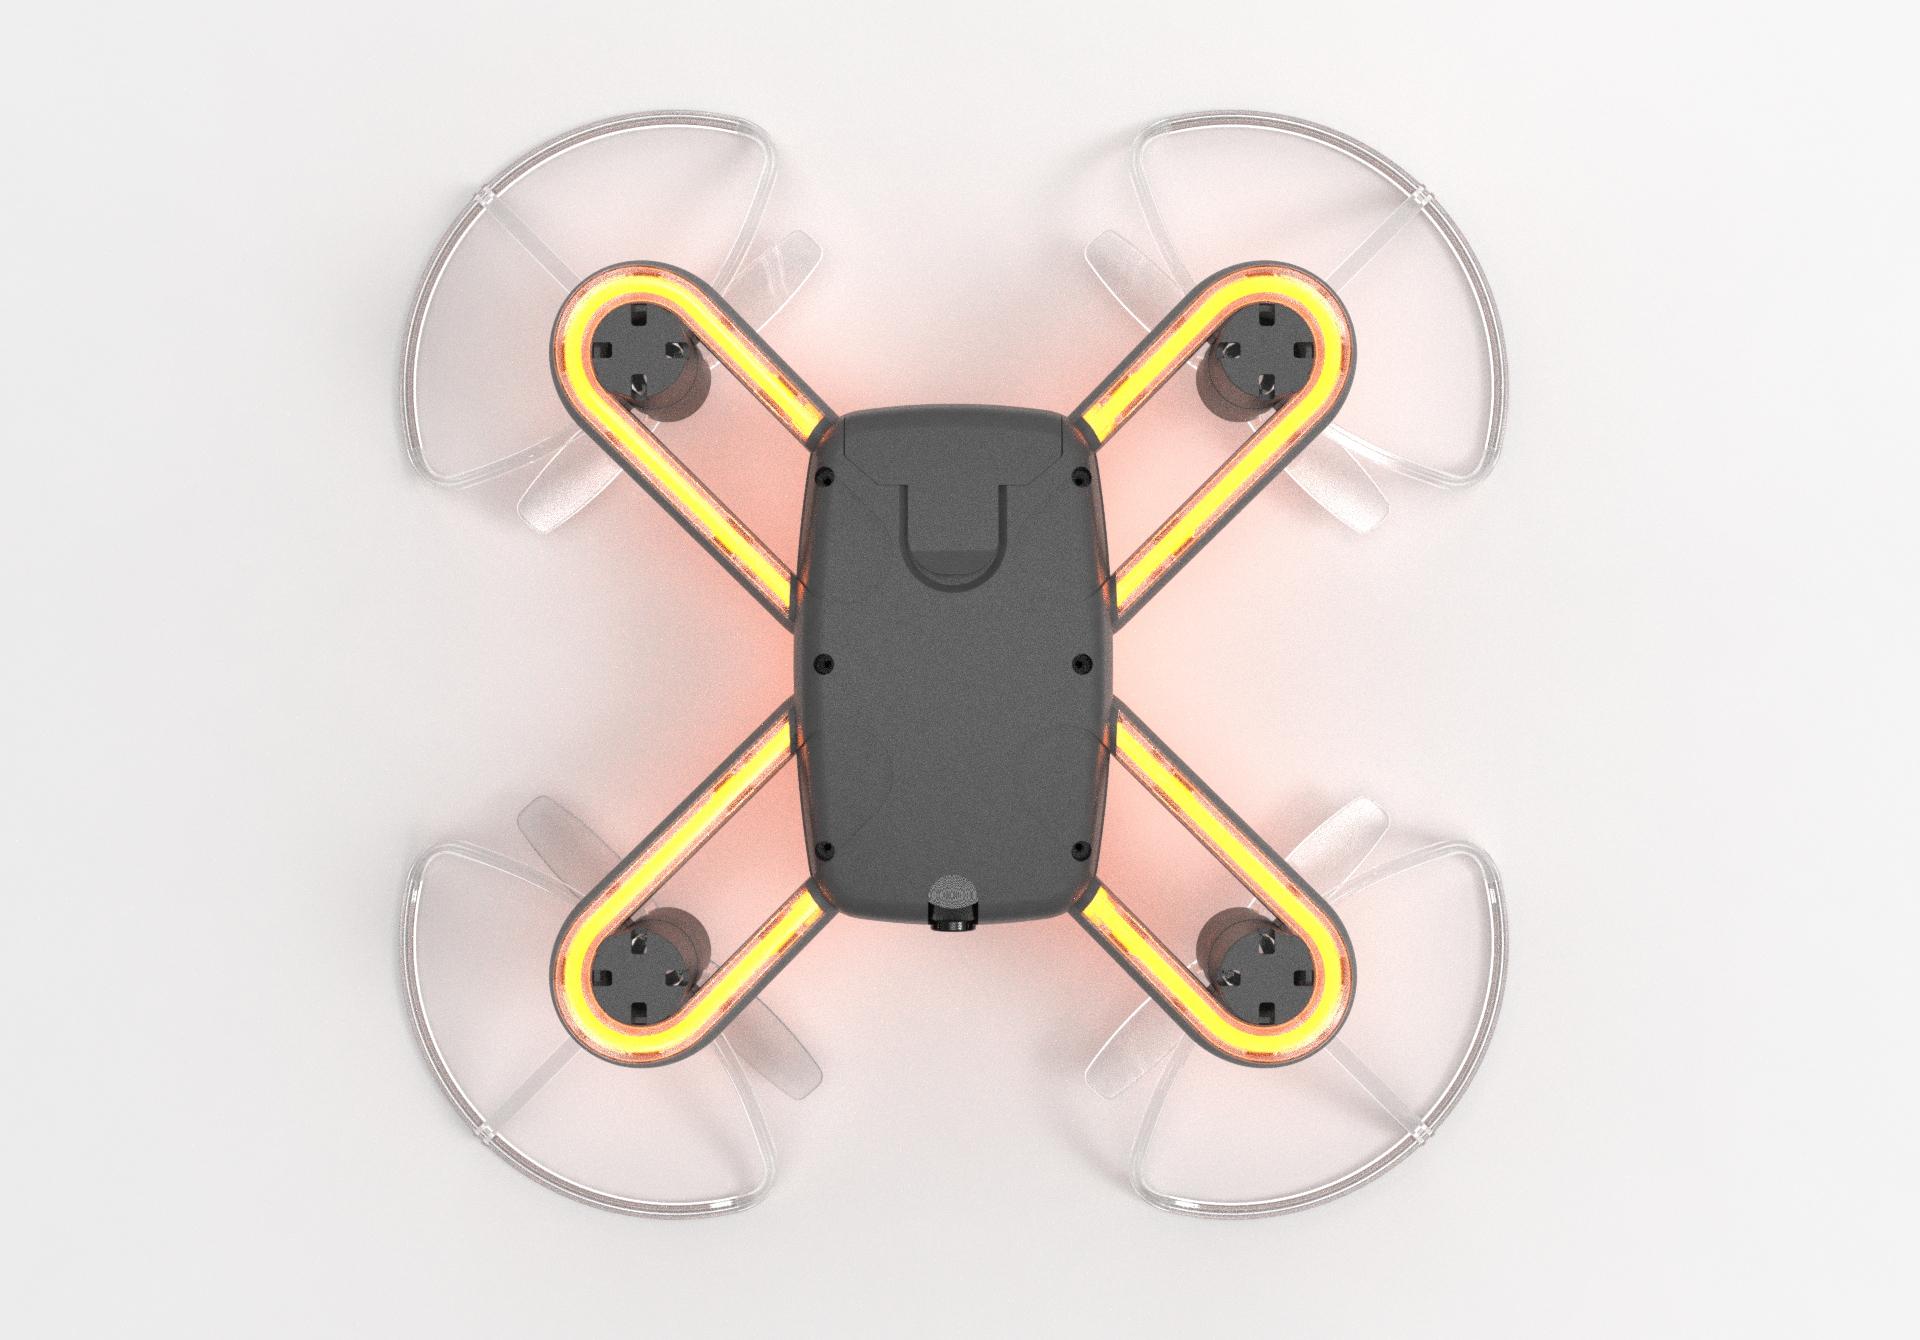 Propel_Ultron_Palm-sized_Camera_Drone_27-09-2017.78.jpg